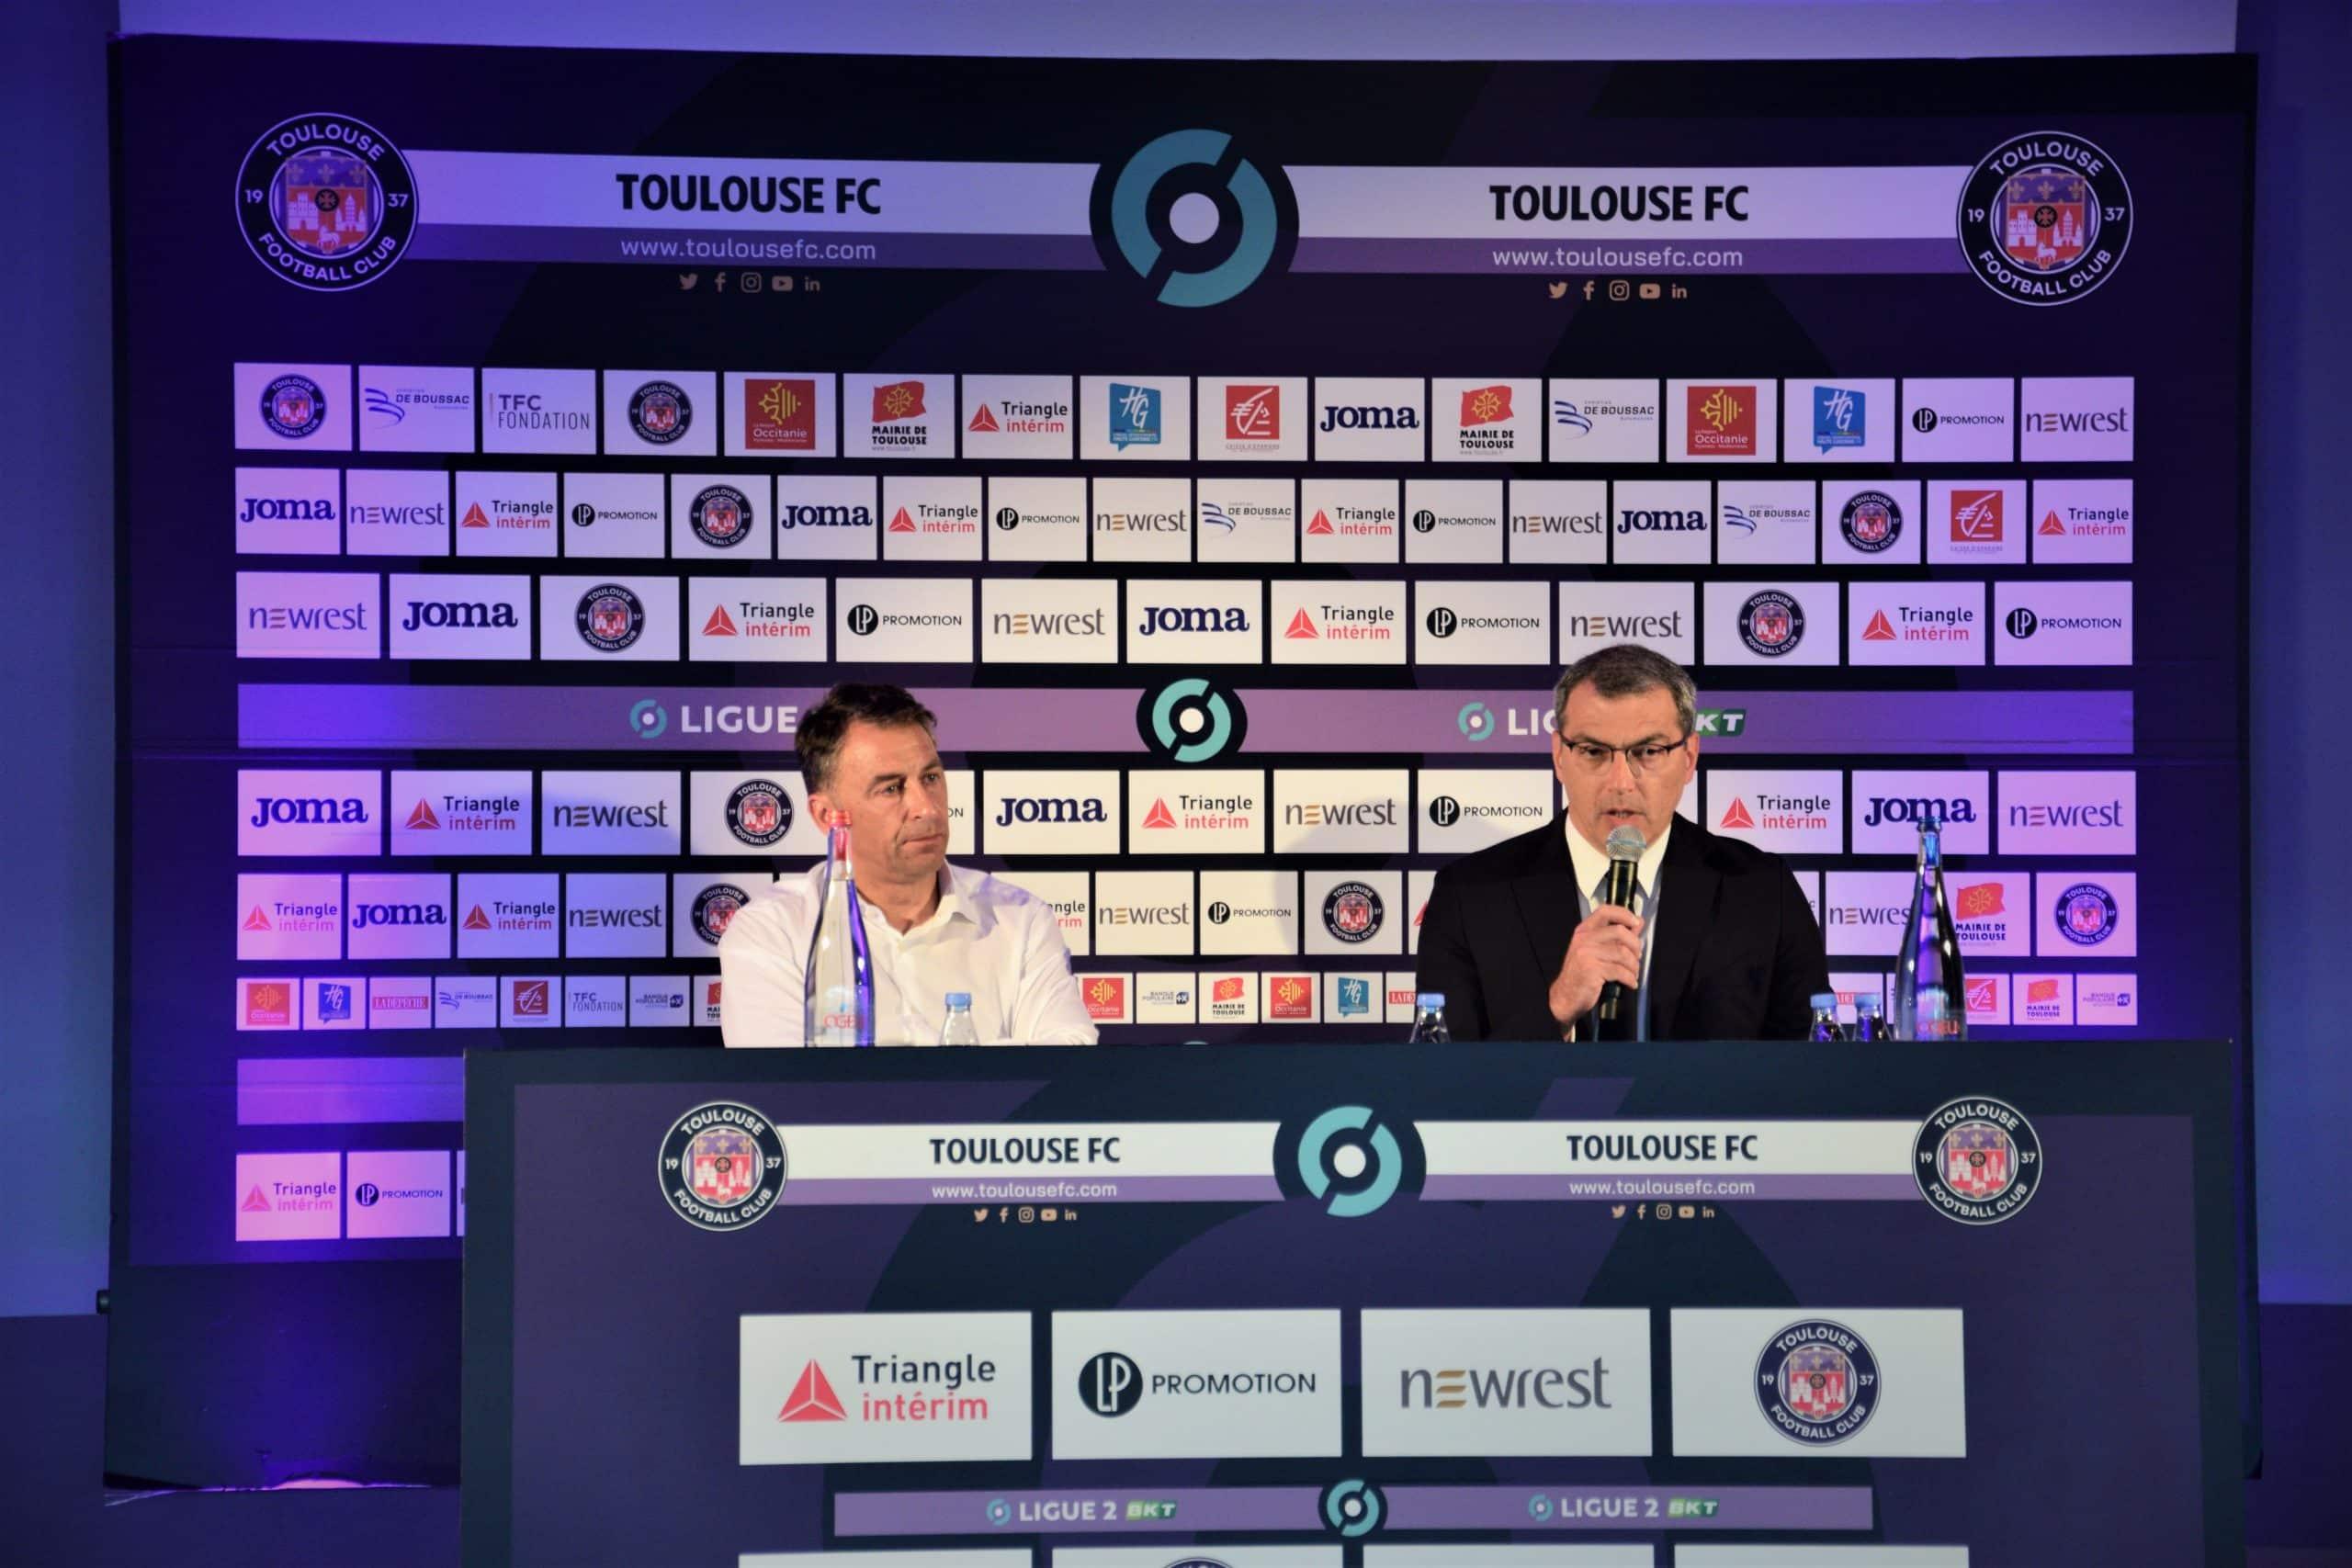 Olivier Sadran et Damien comolli - Toulouse Footbal club TFC